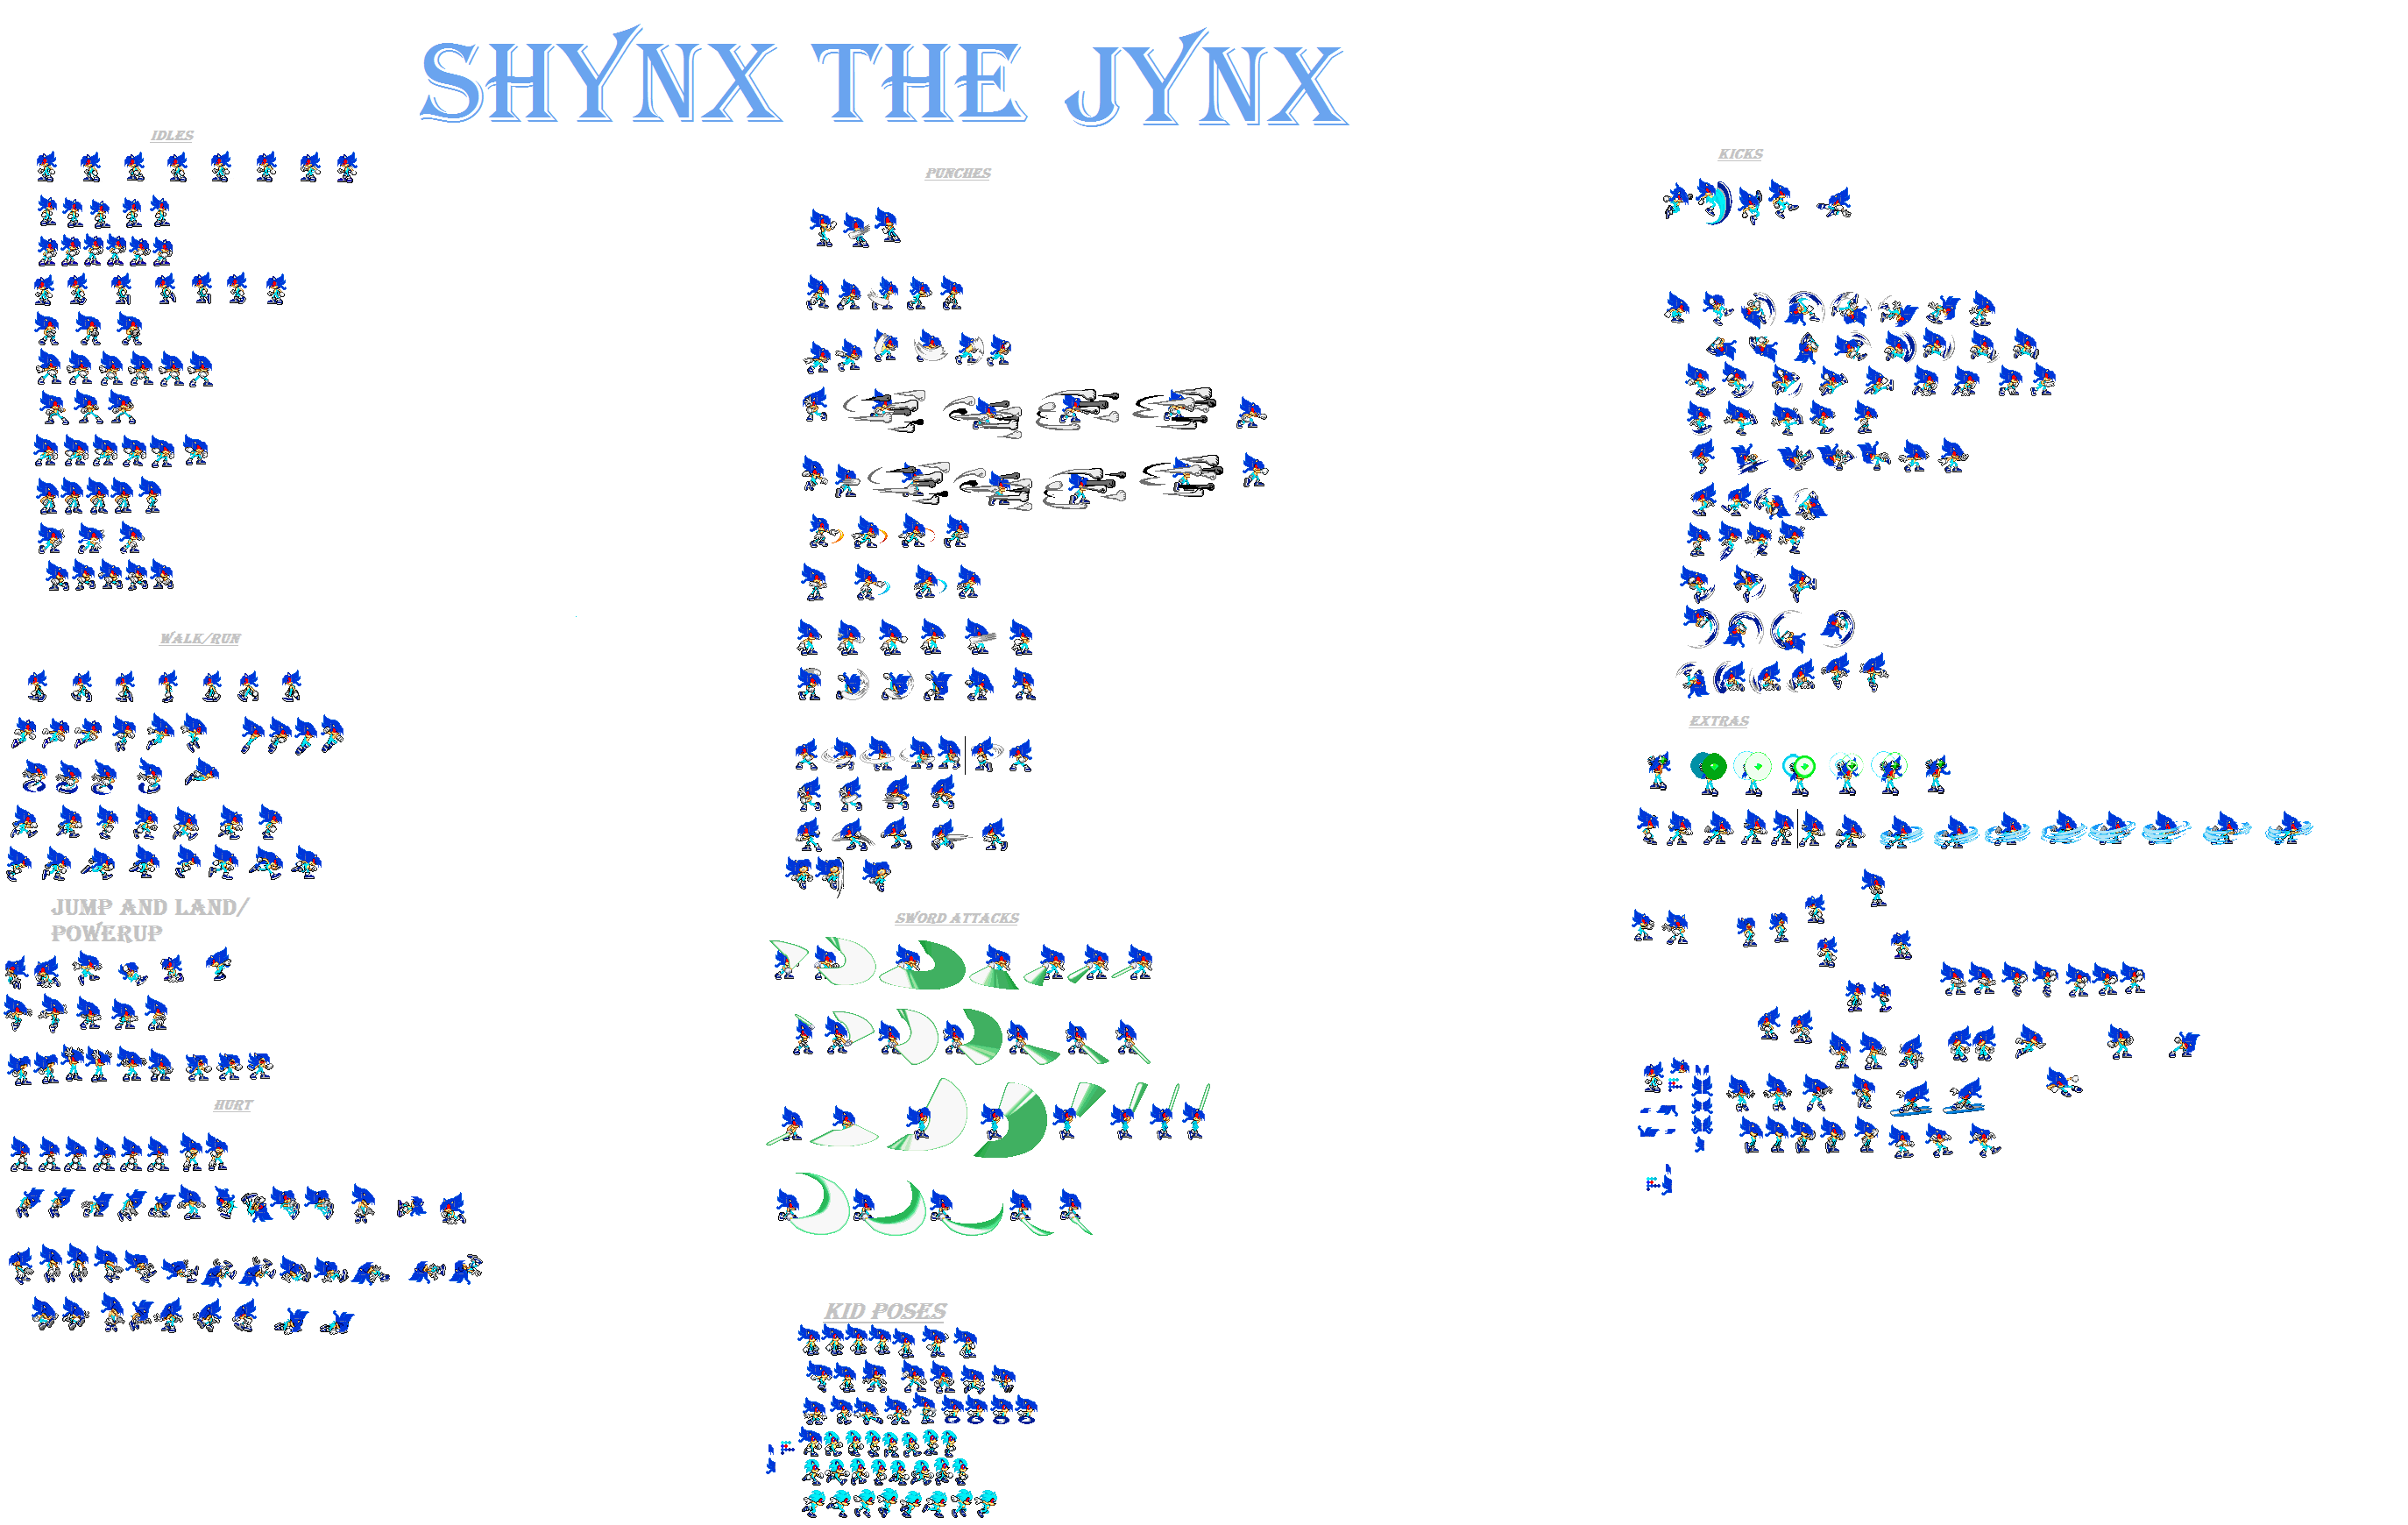 Shynx The Jynx